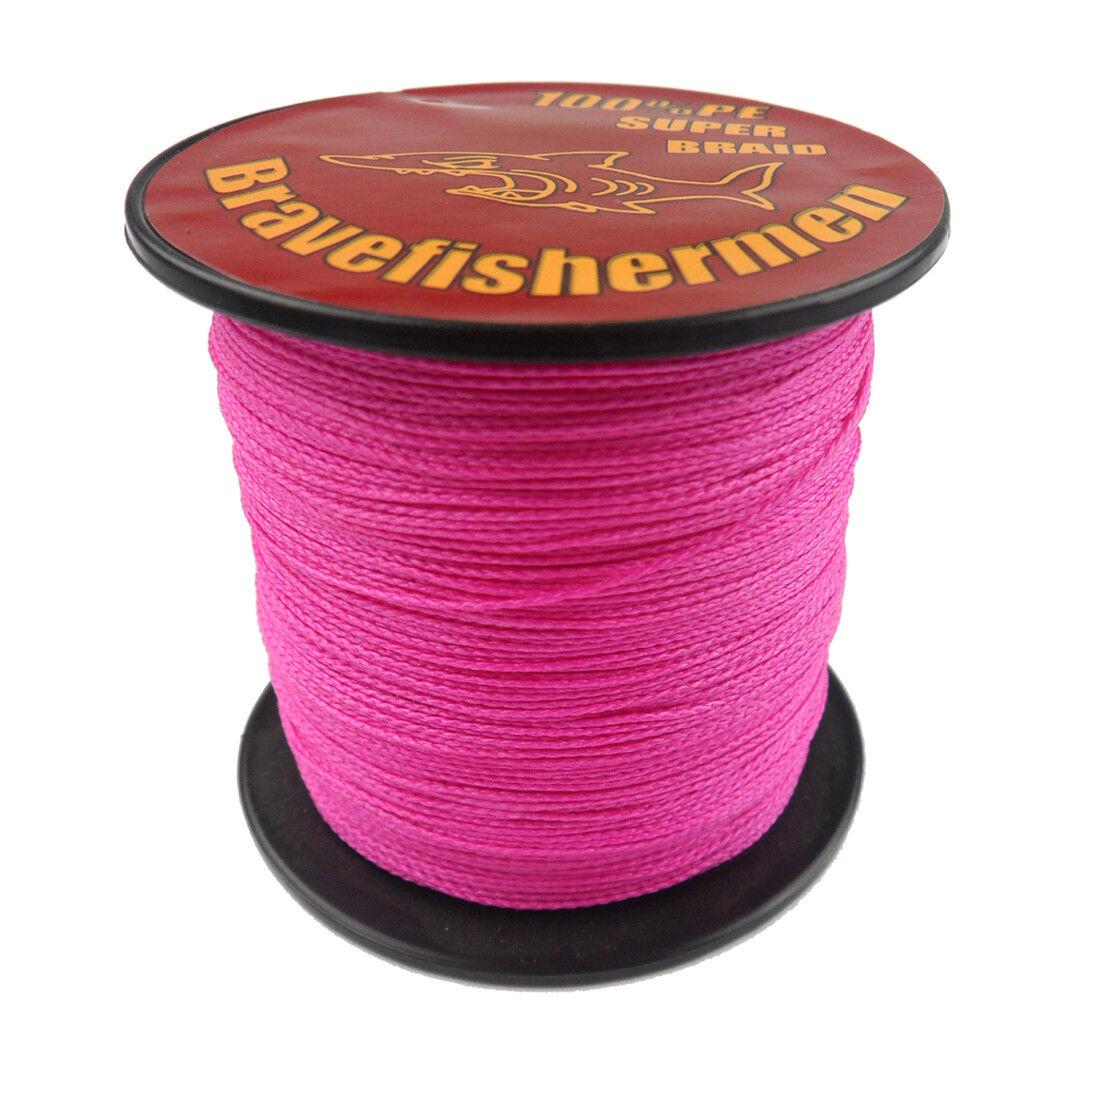 Strong Pink 100-1000M 6-300LB Test Dyneema Braided Fishing Line Bravefishermen